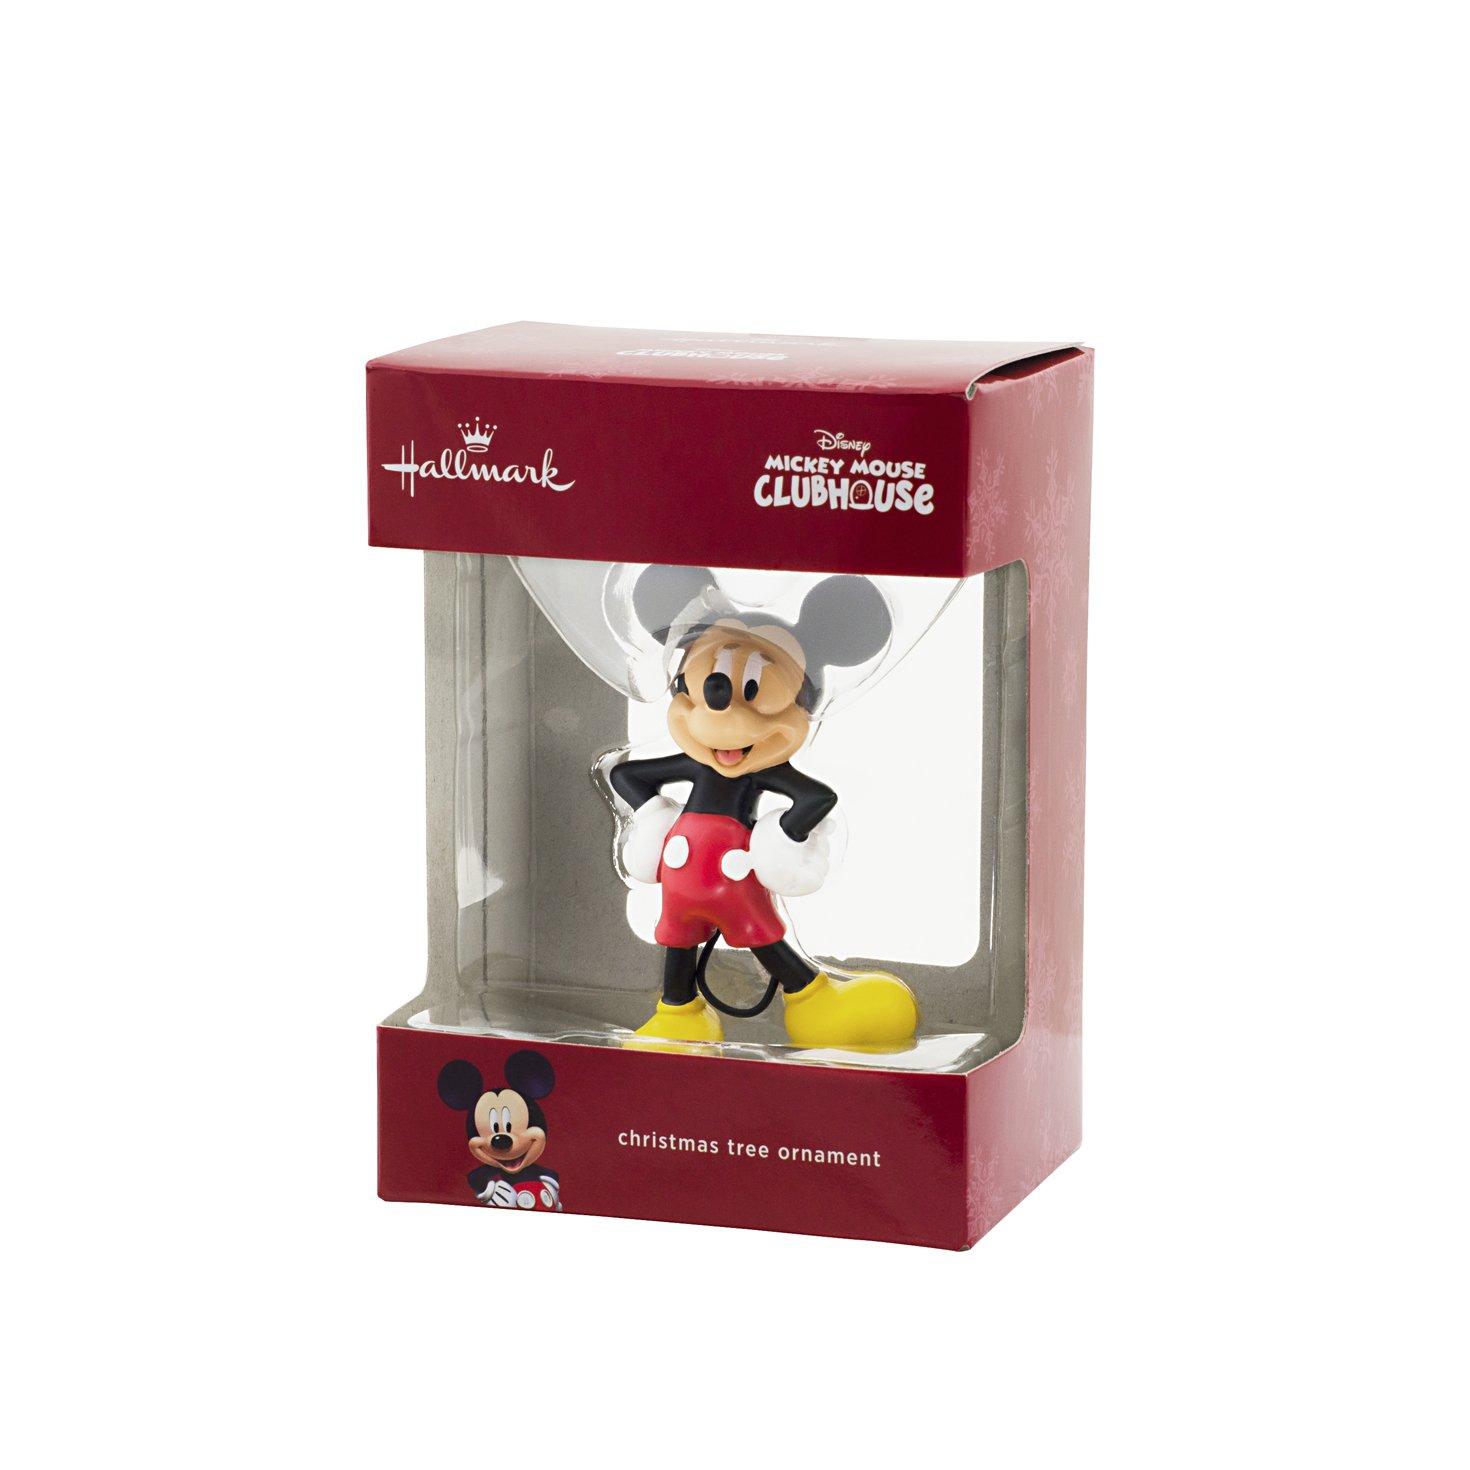 Amazoncom Hallmark Disney Mickeyminnie Christmas Ornament Home & Kitchen